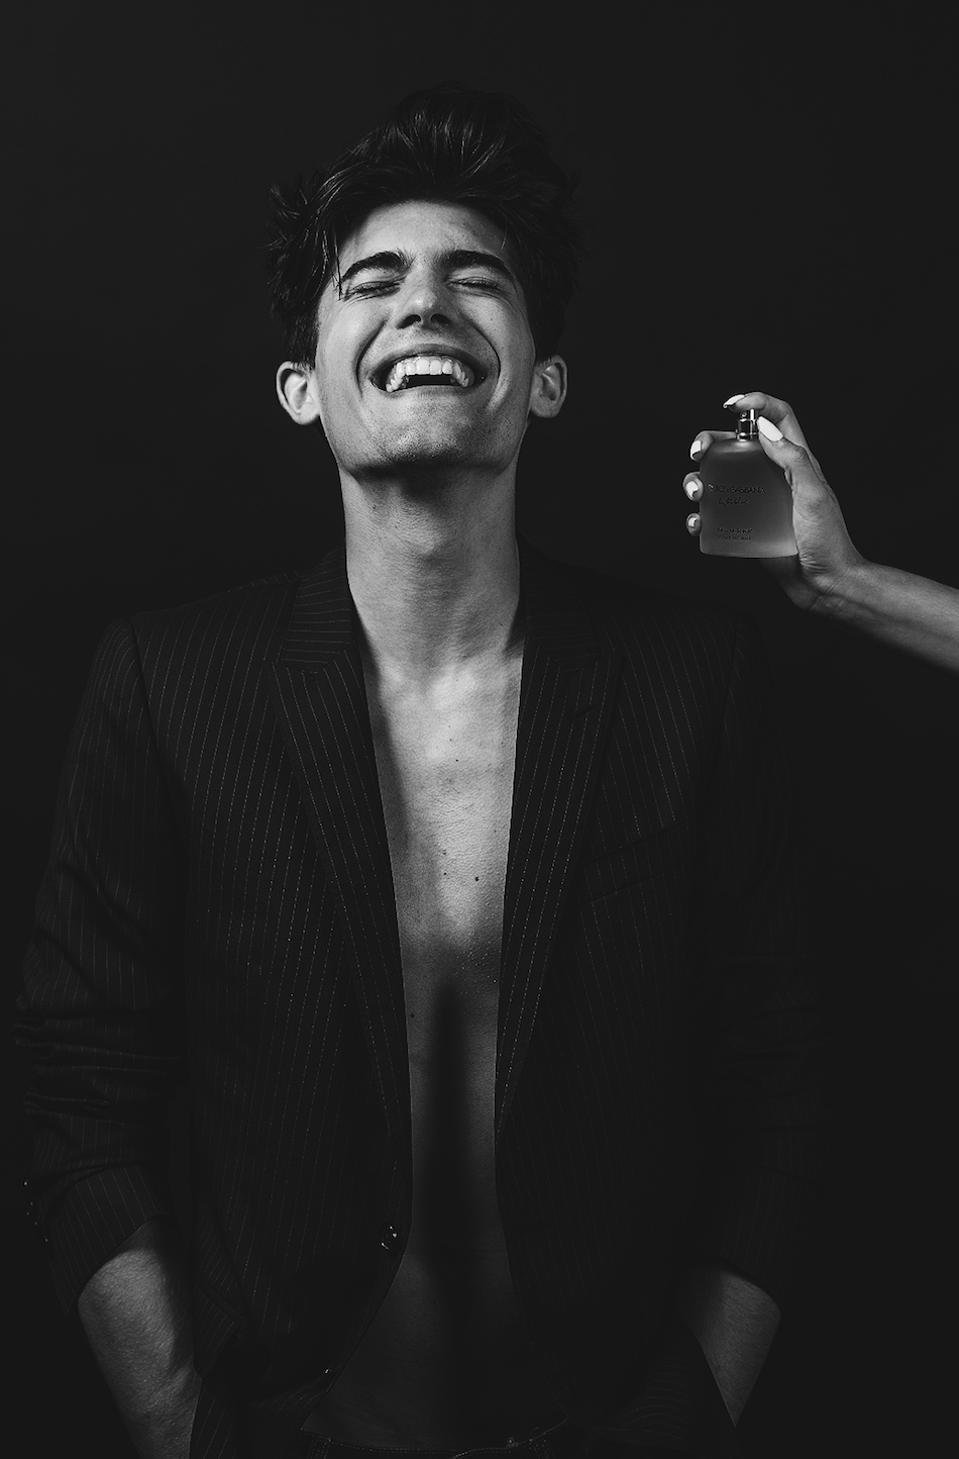 Musician/Style Influencer Noah Metzdorf for Dolce & Gabbana Men's Fragrance